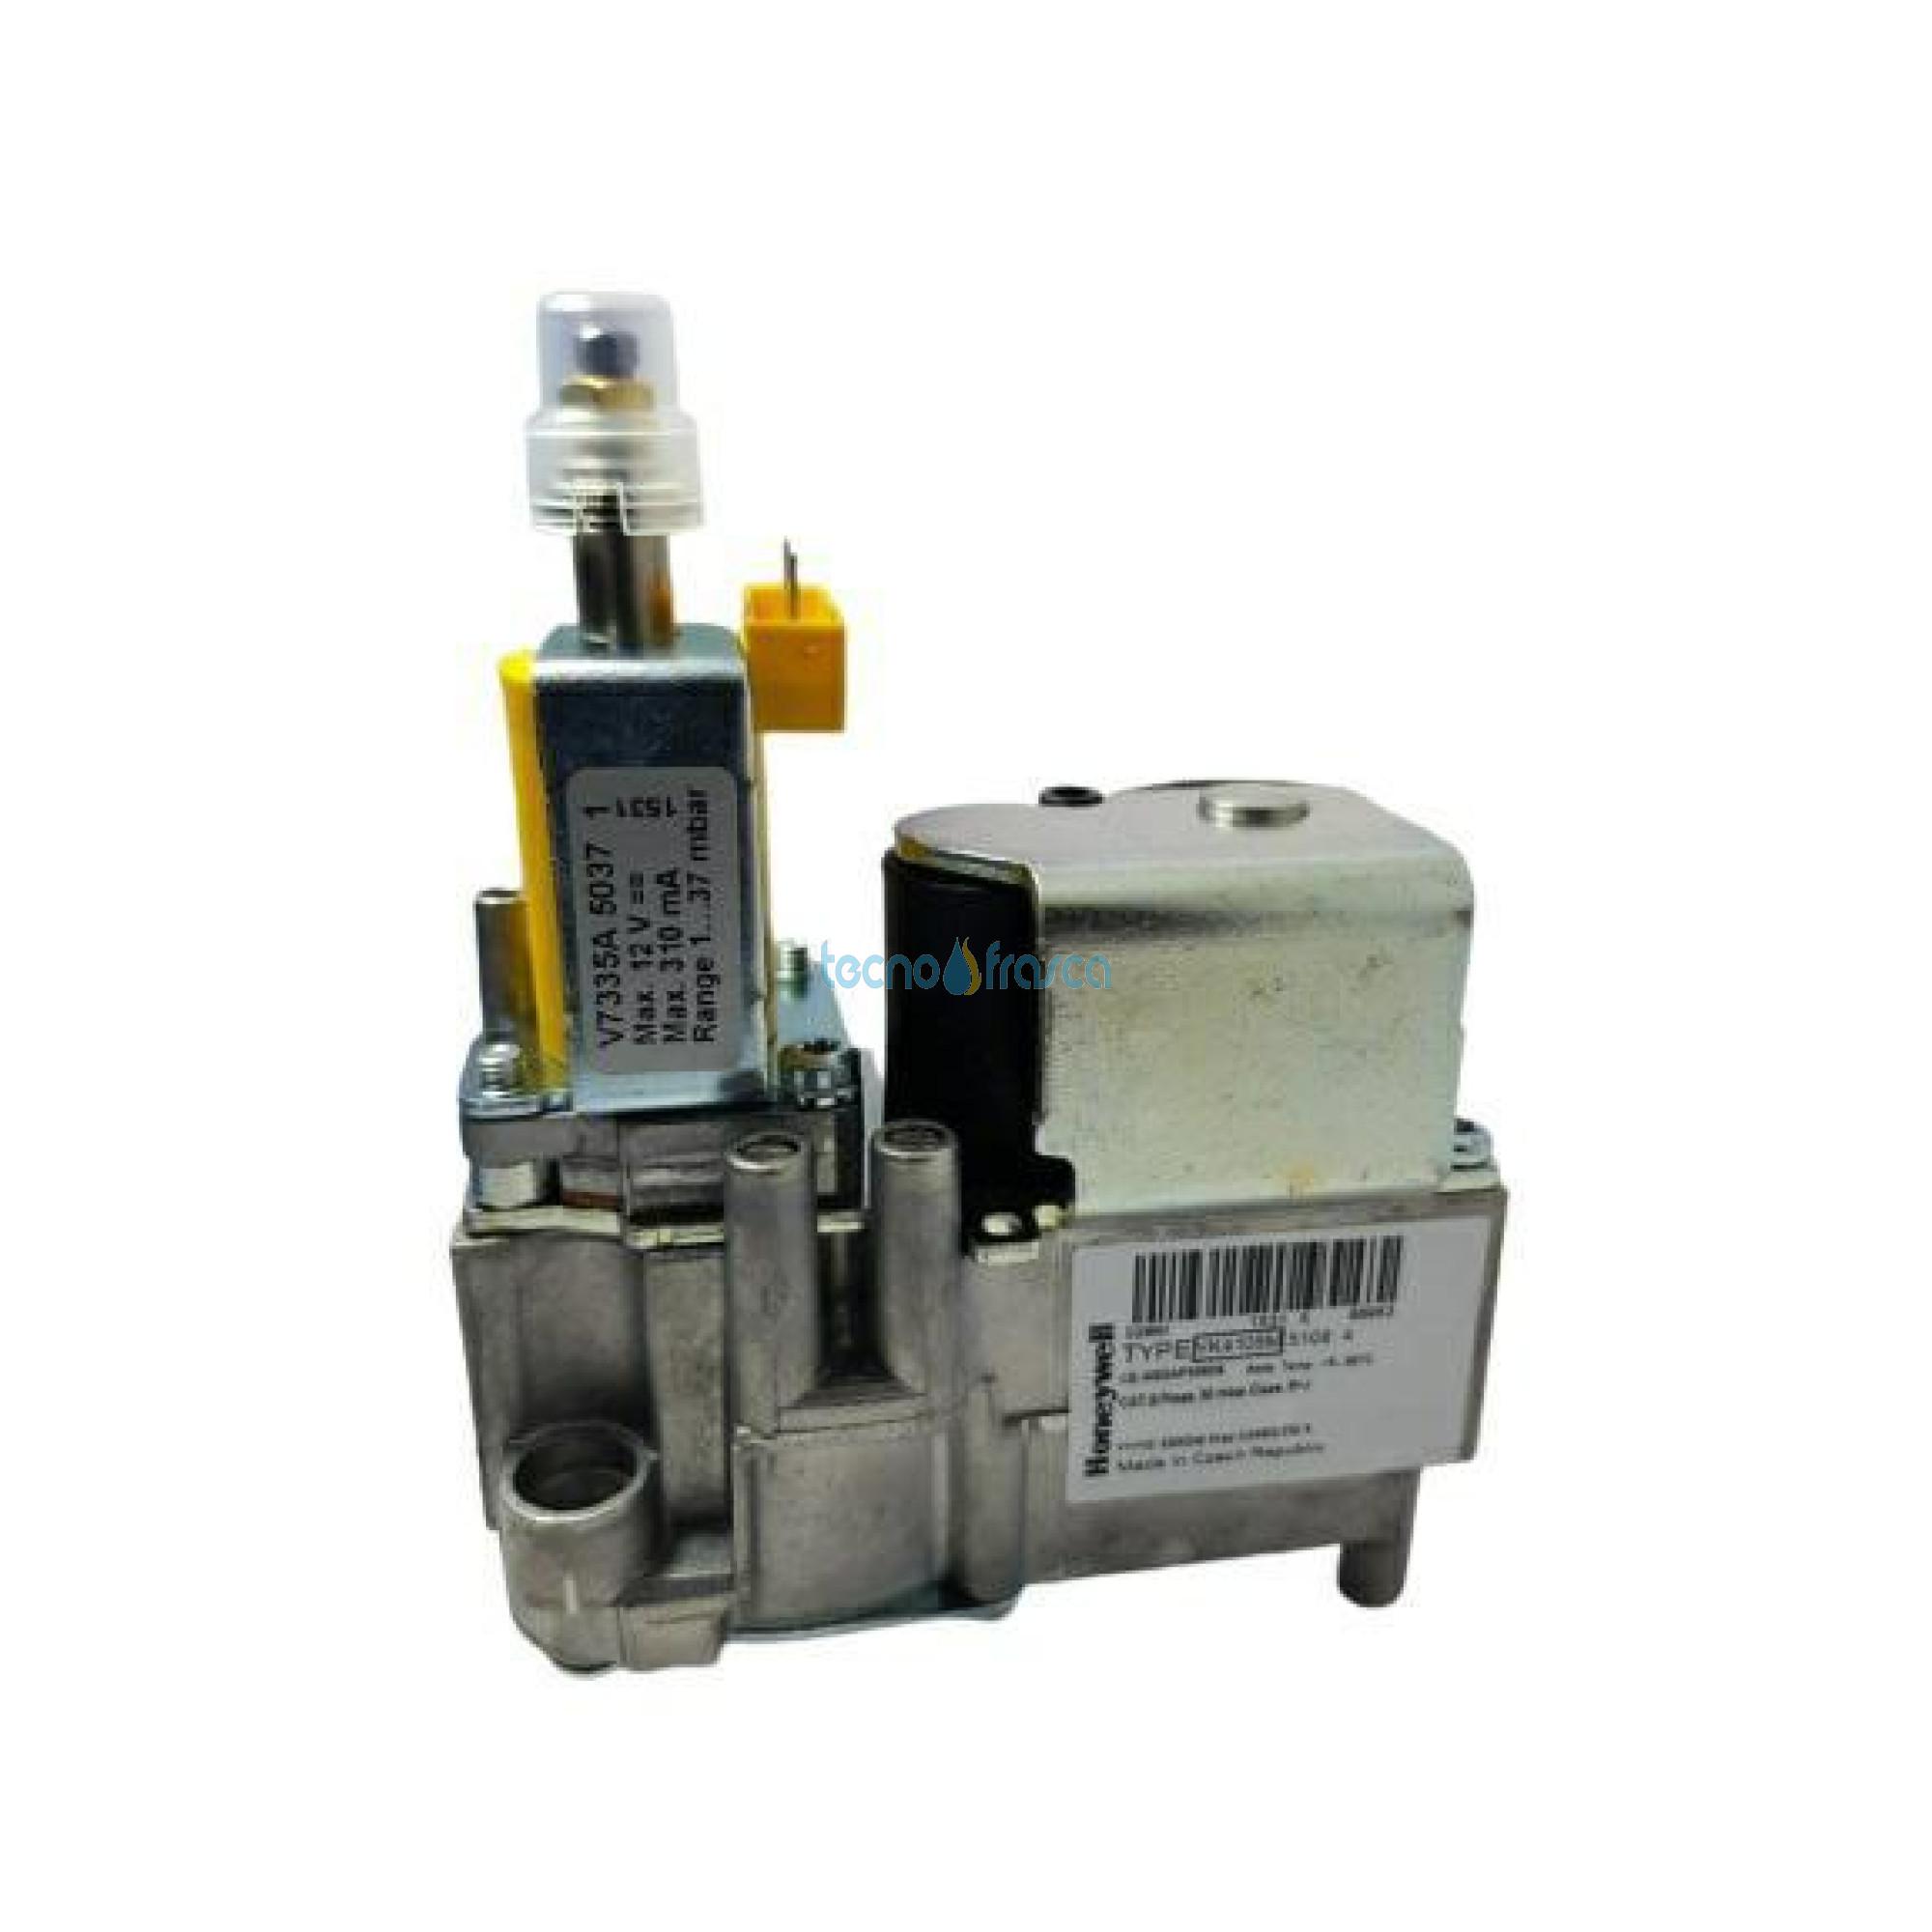 Baxi valvola gas vk4105m5108 jjj005665210